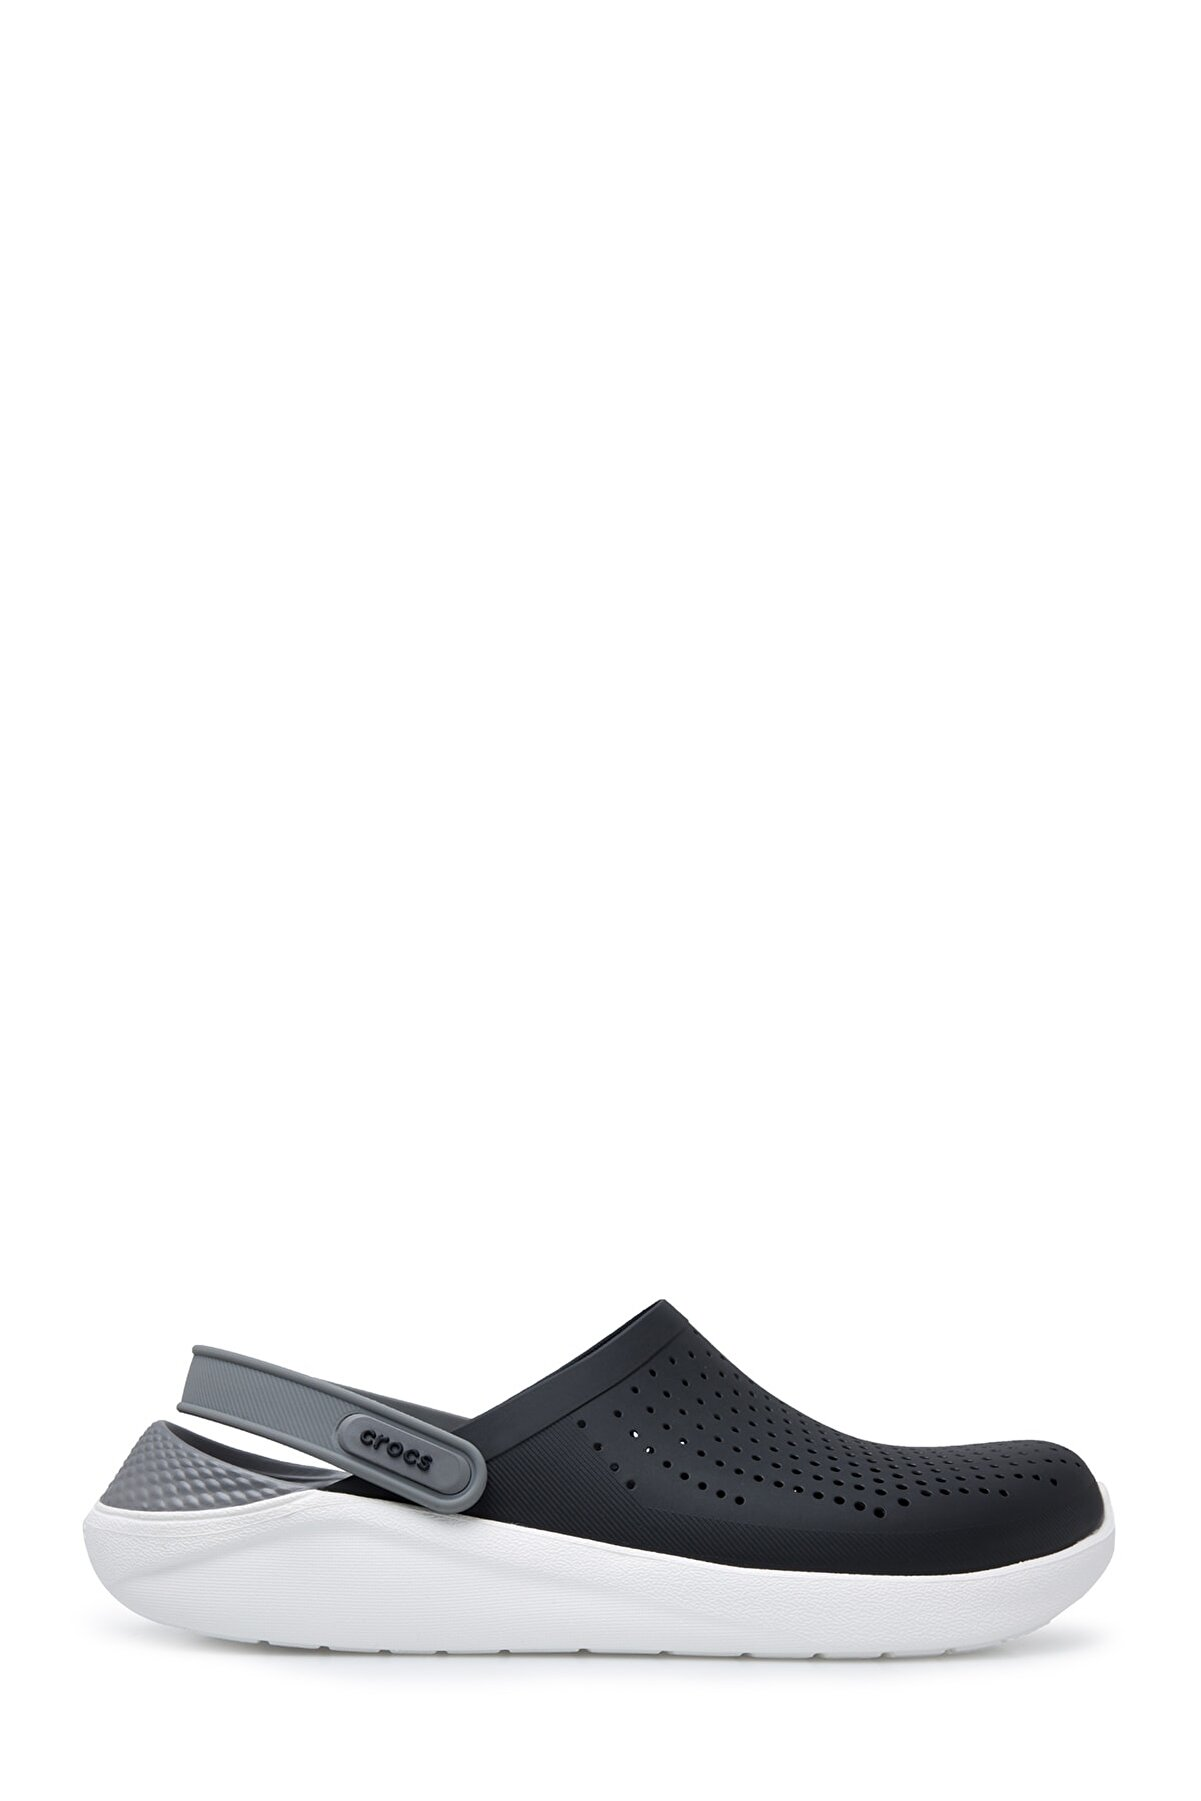 Crocs Lite Ride Clog Terlik 0 Terlik 204592